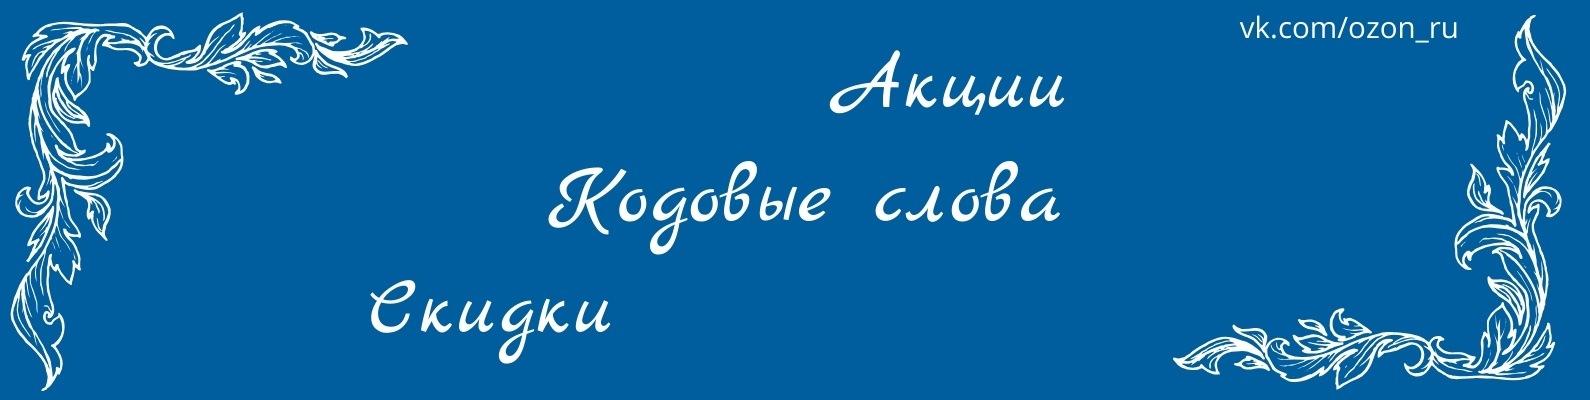 d975f3a887d2 Промокод Ozon   Озон ру   Магазин   ВКонтакте